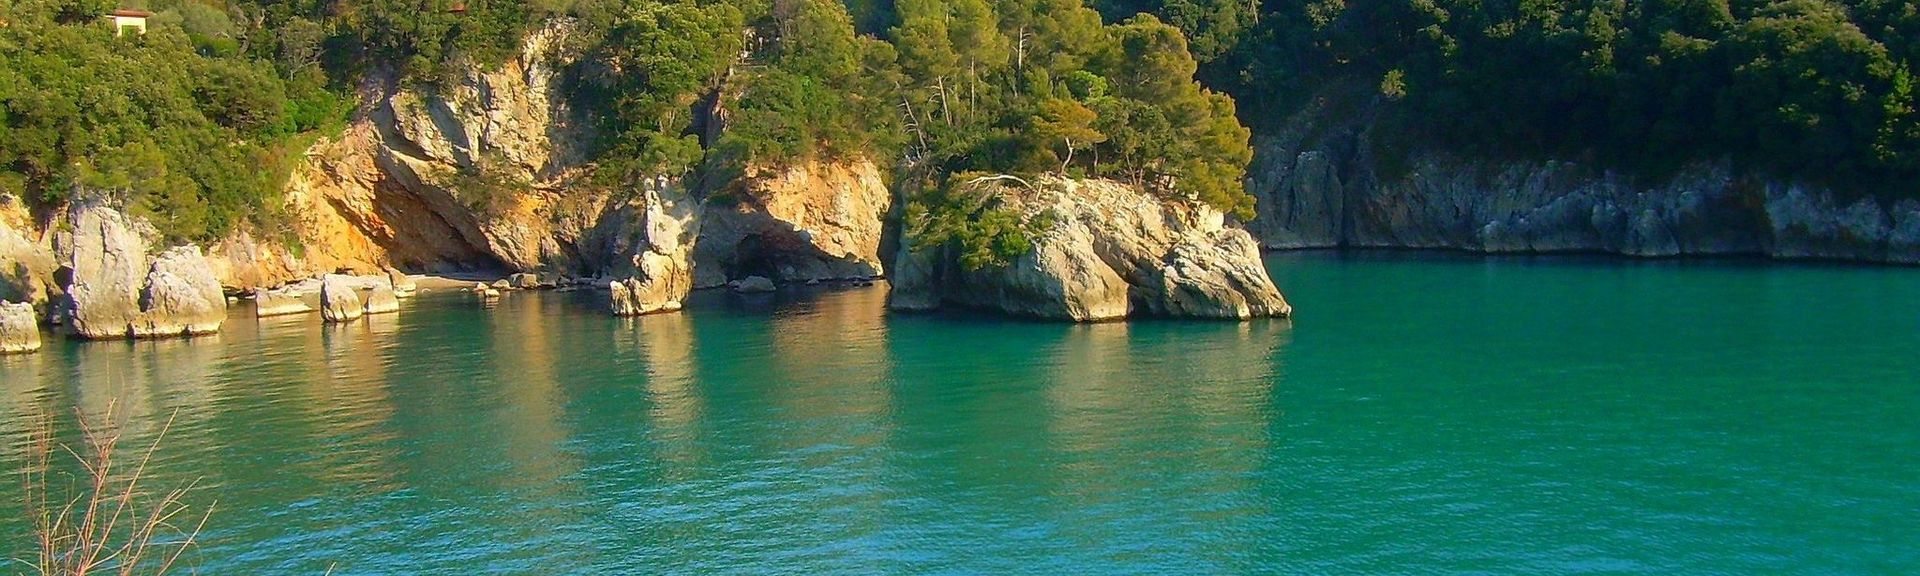 Beverino, Liguria, Italy